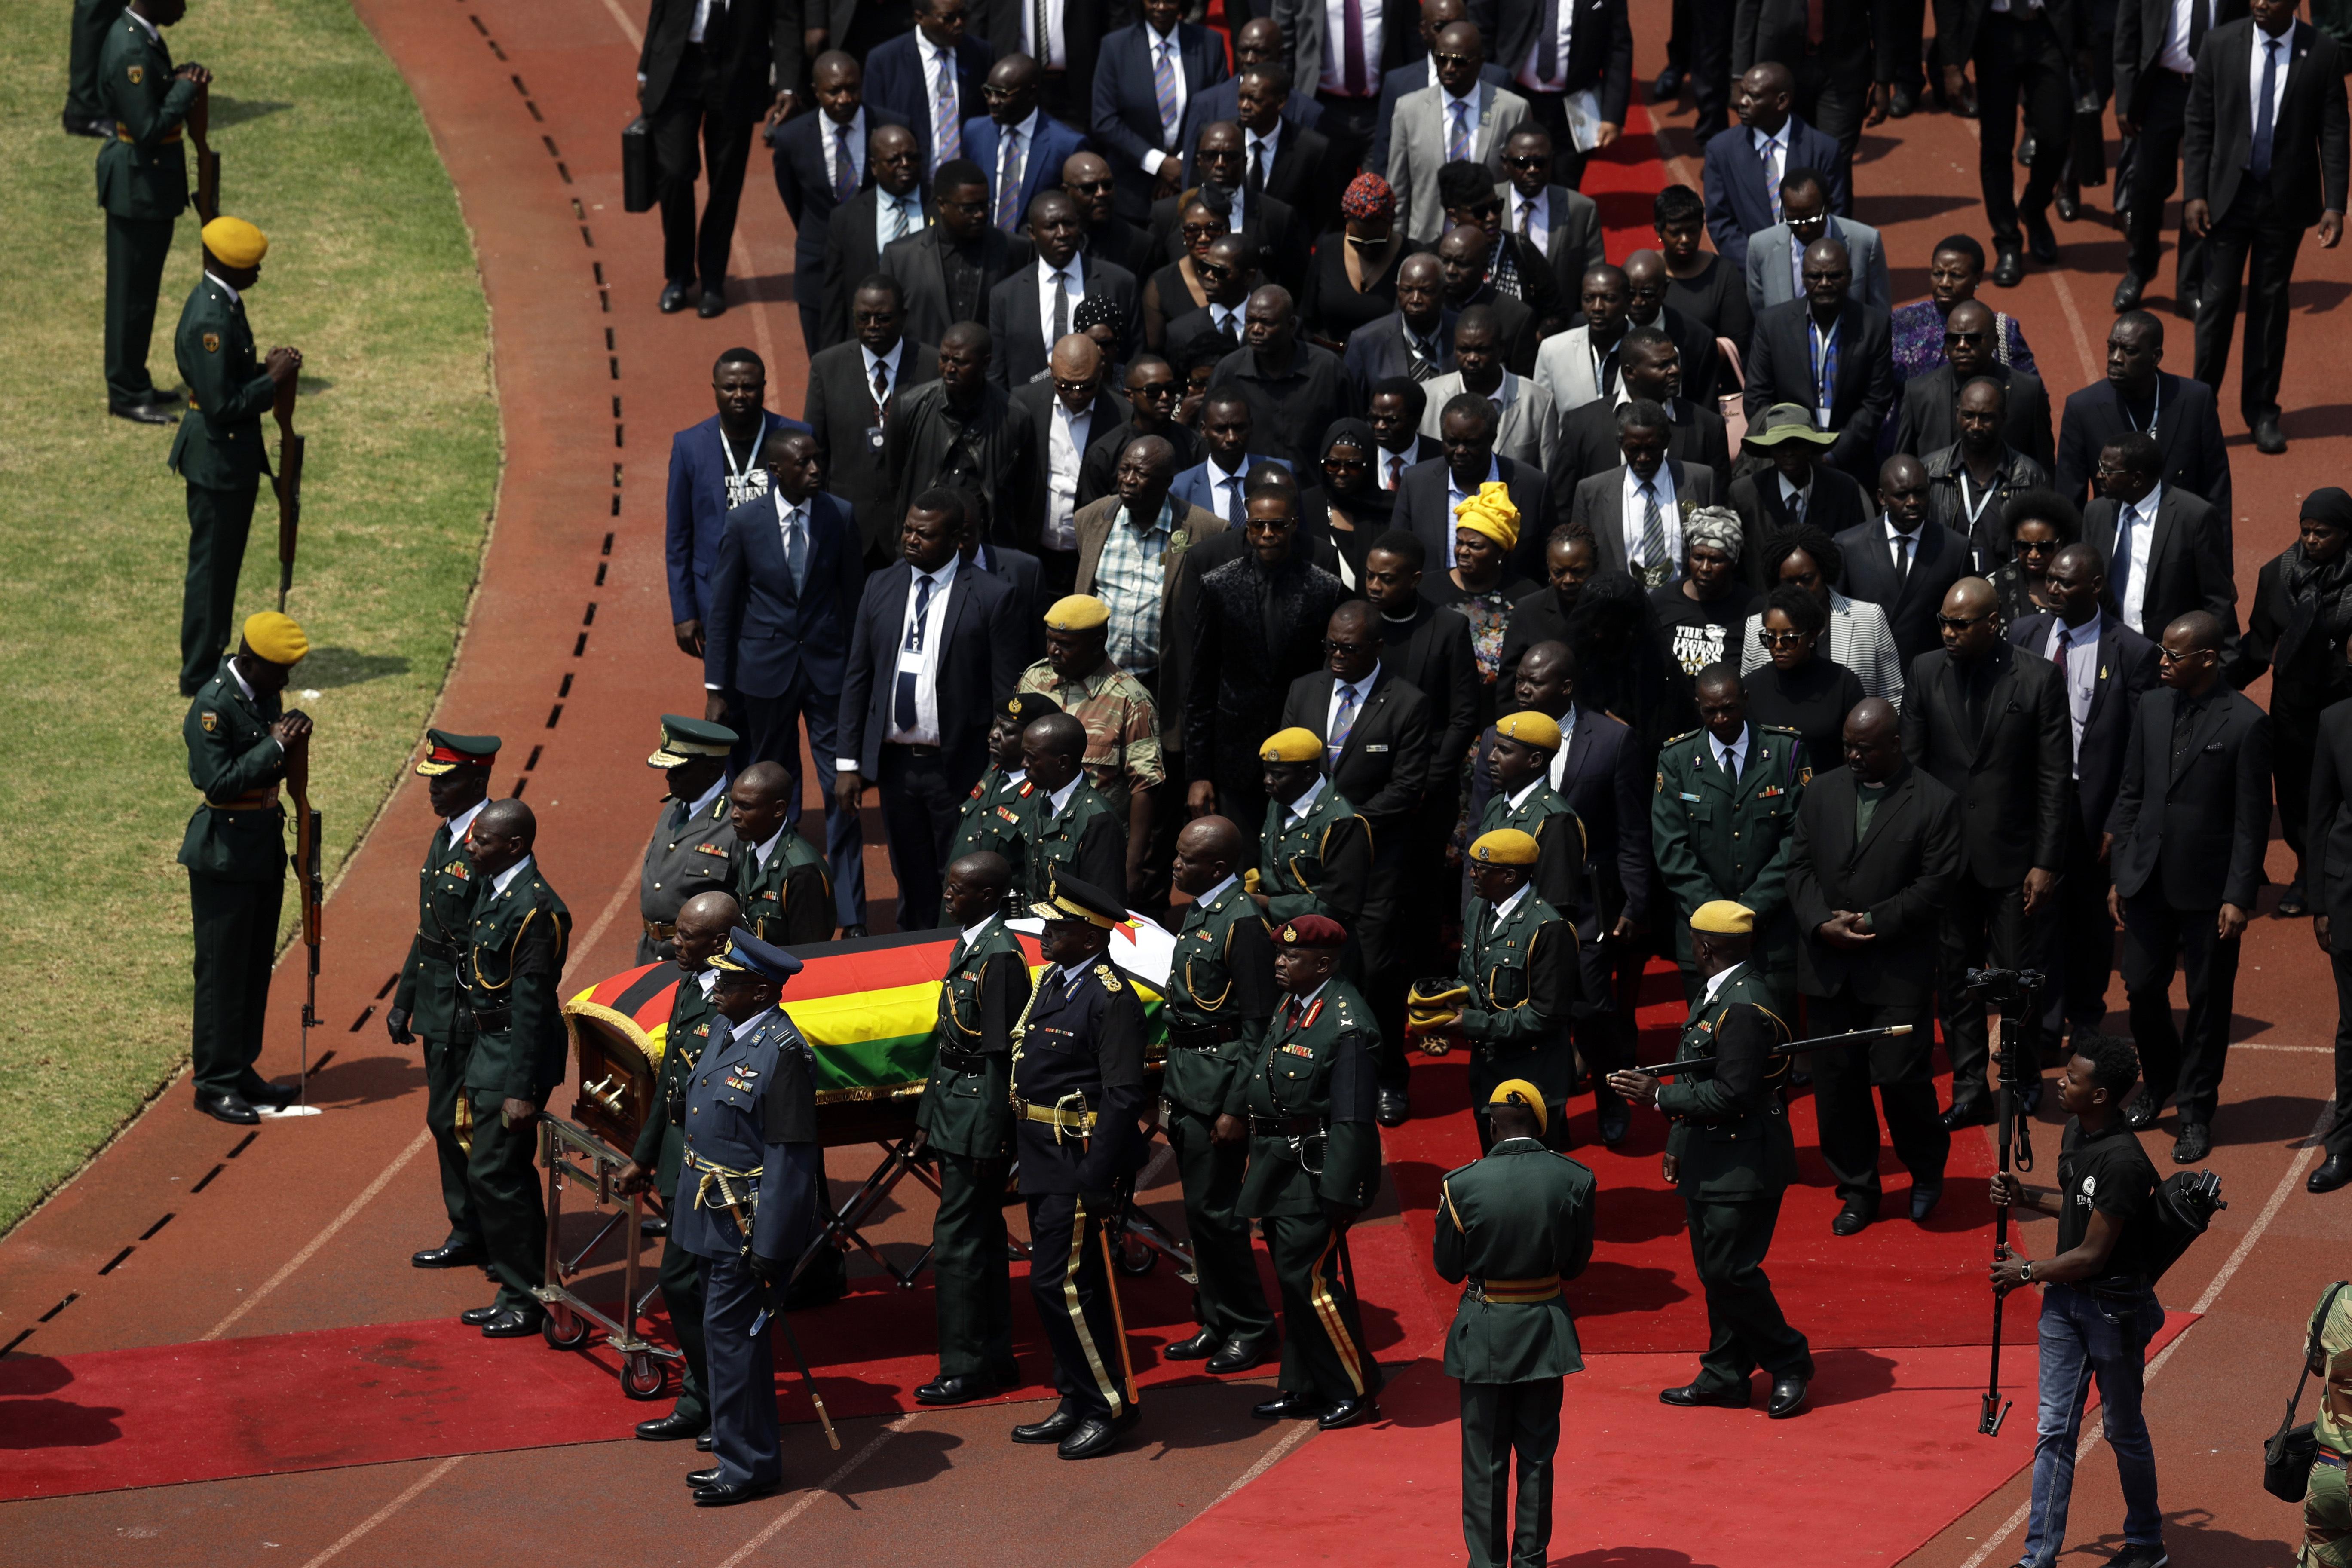 Zimbabwes Mugabe honored at state funeral, burial delayed